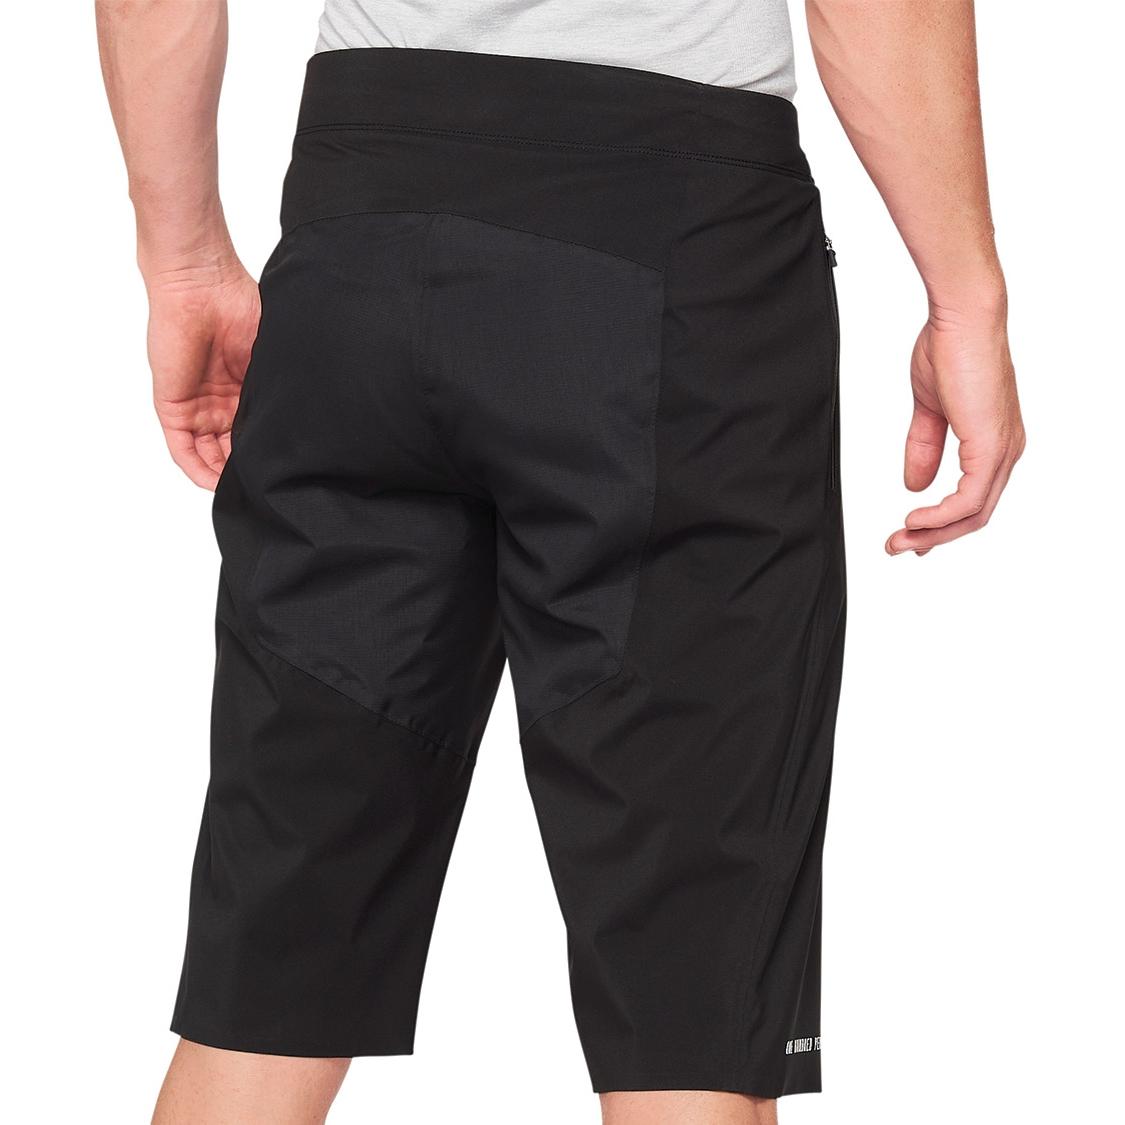 Imagen de 100% Hydromatic Shorts Pantalones - black